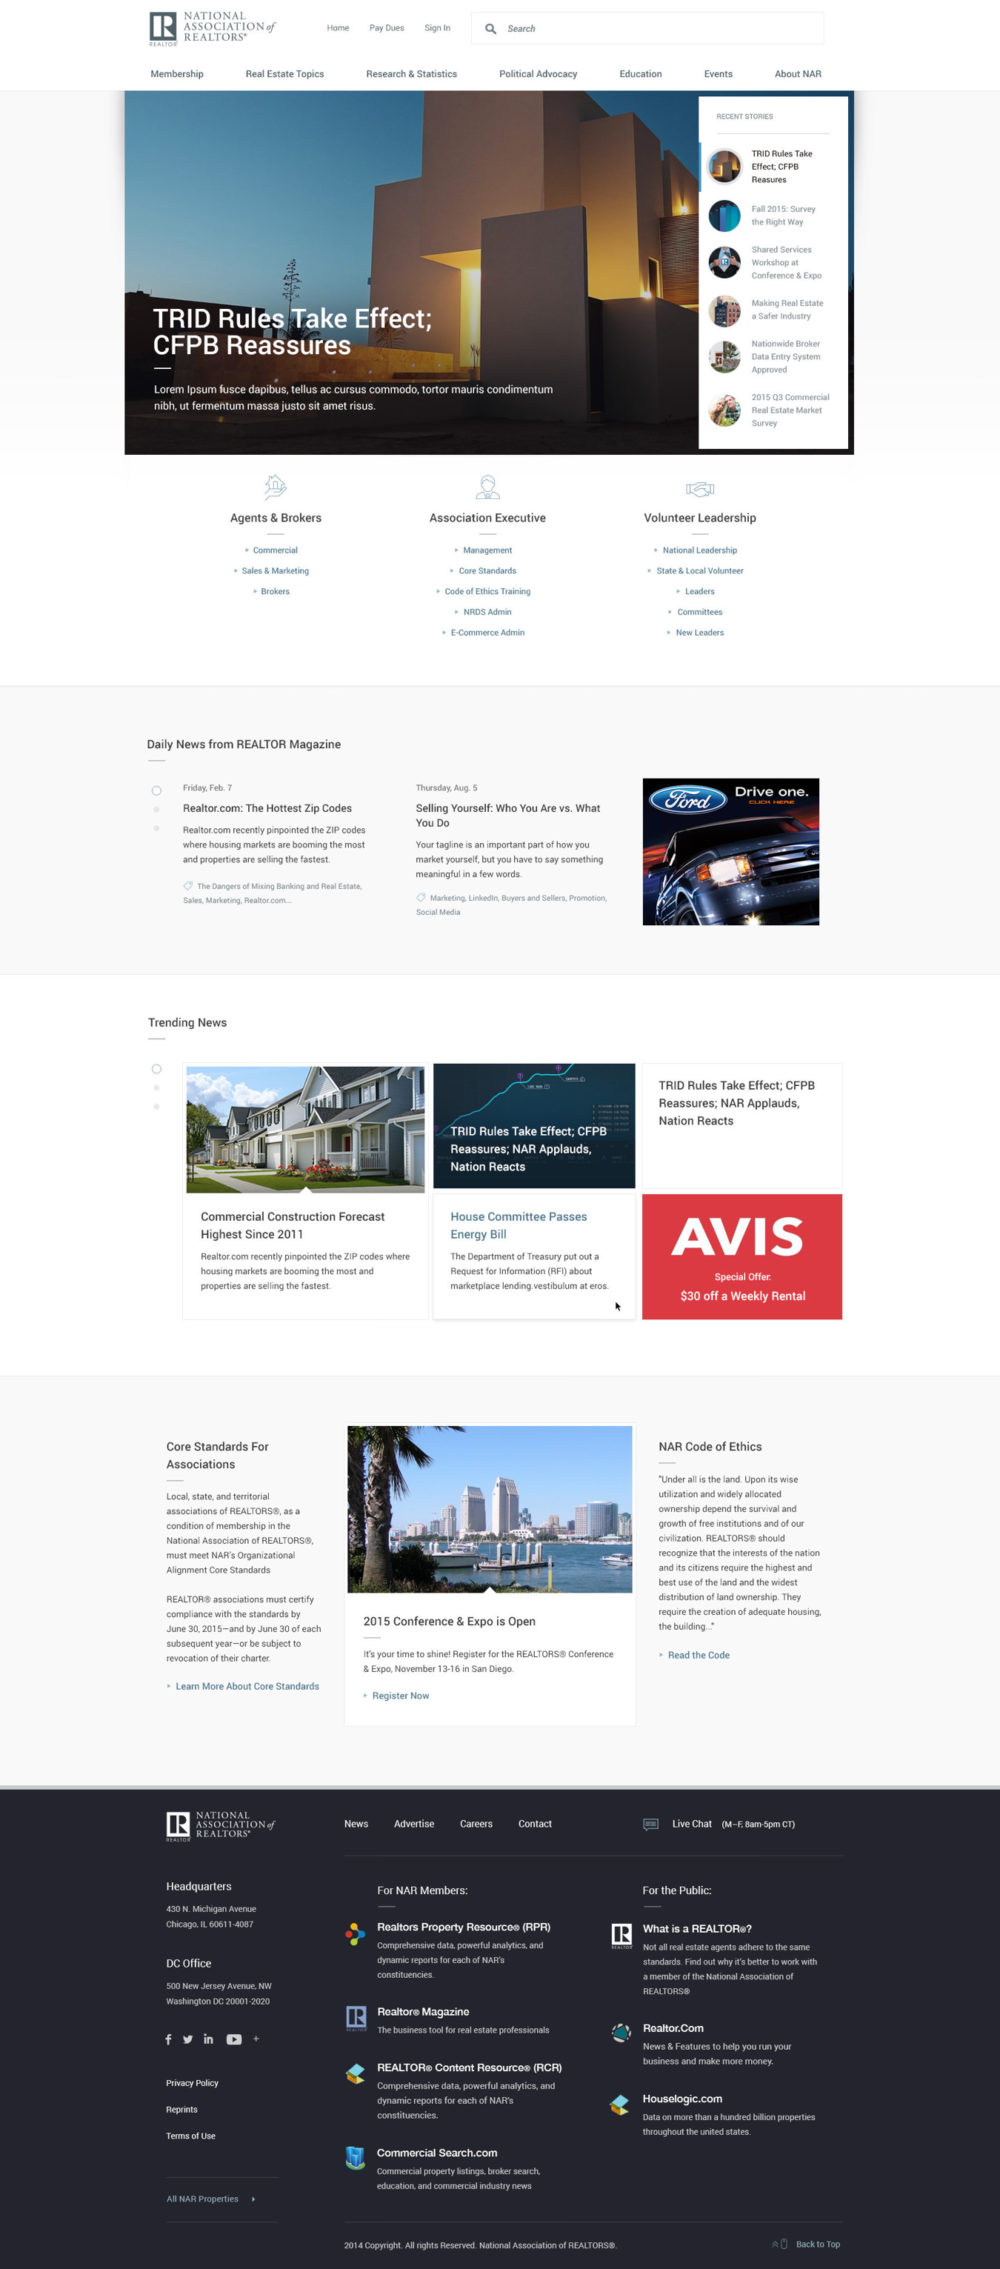 National Association of Realtors homepage mockup